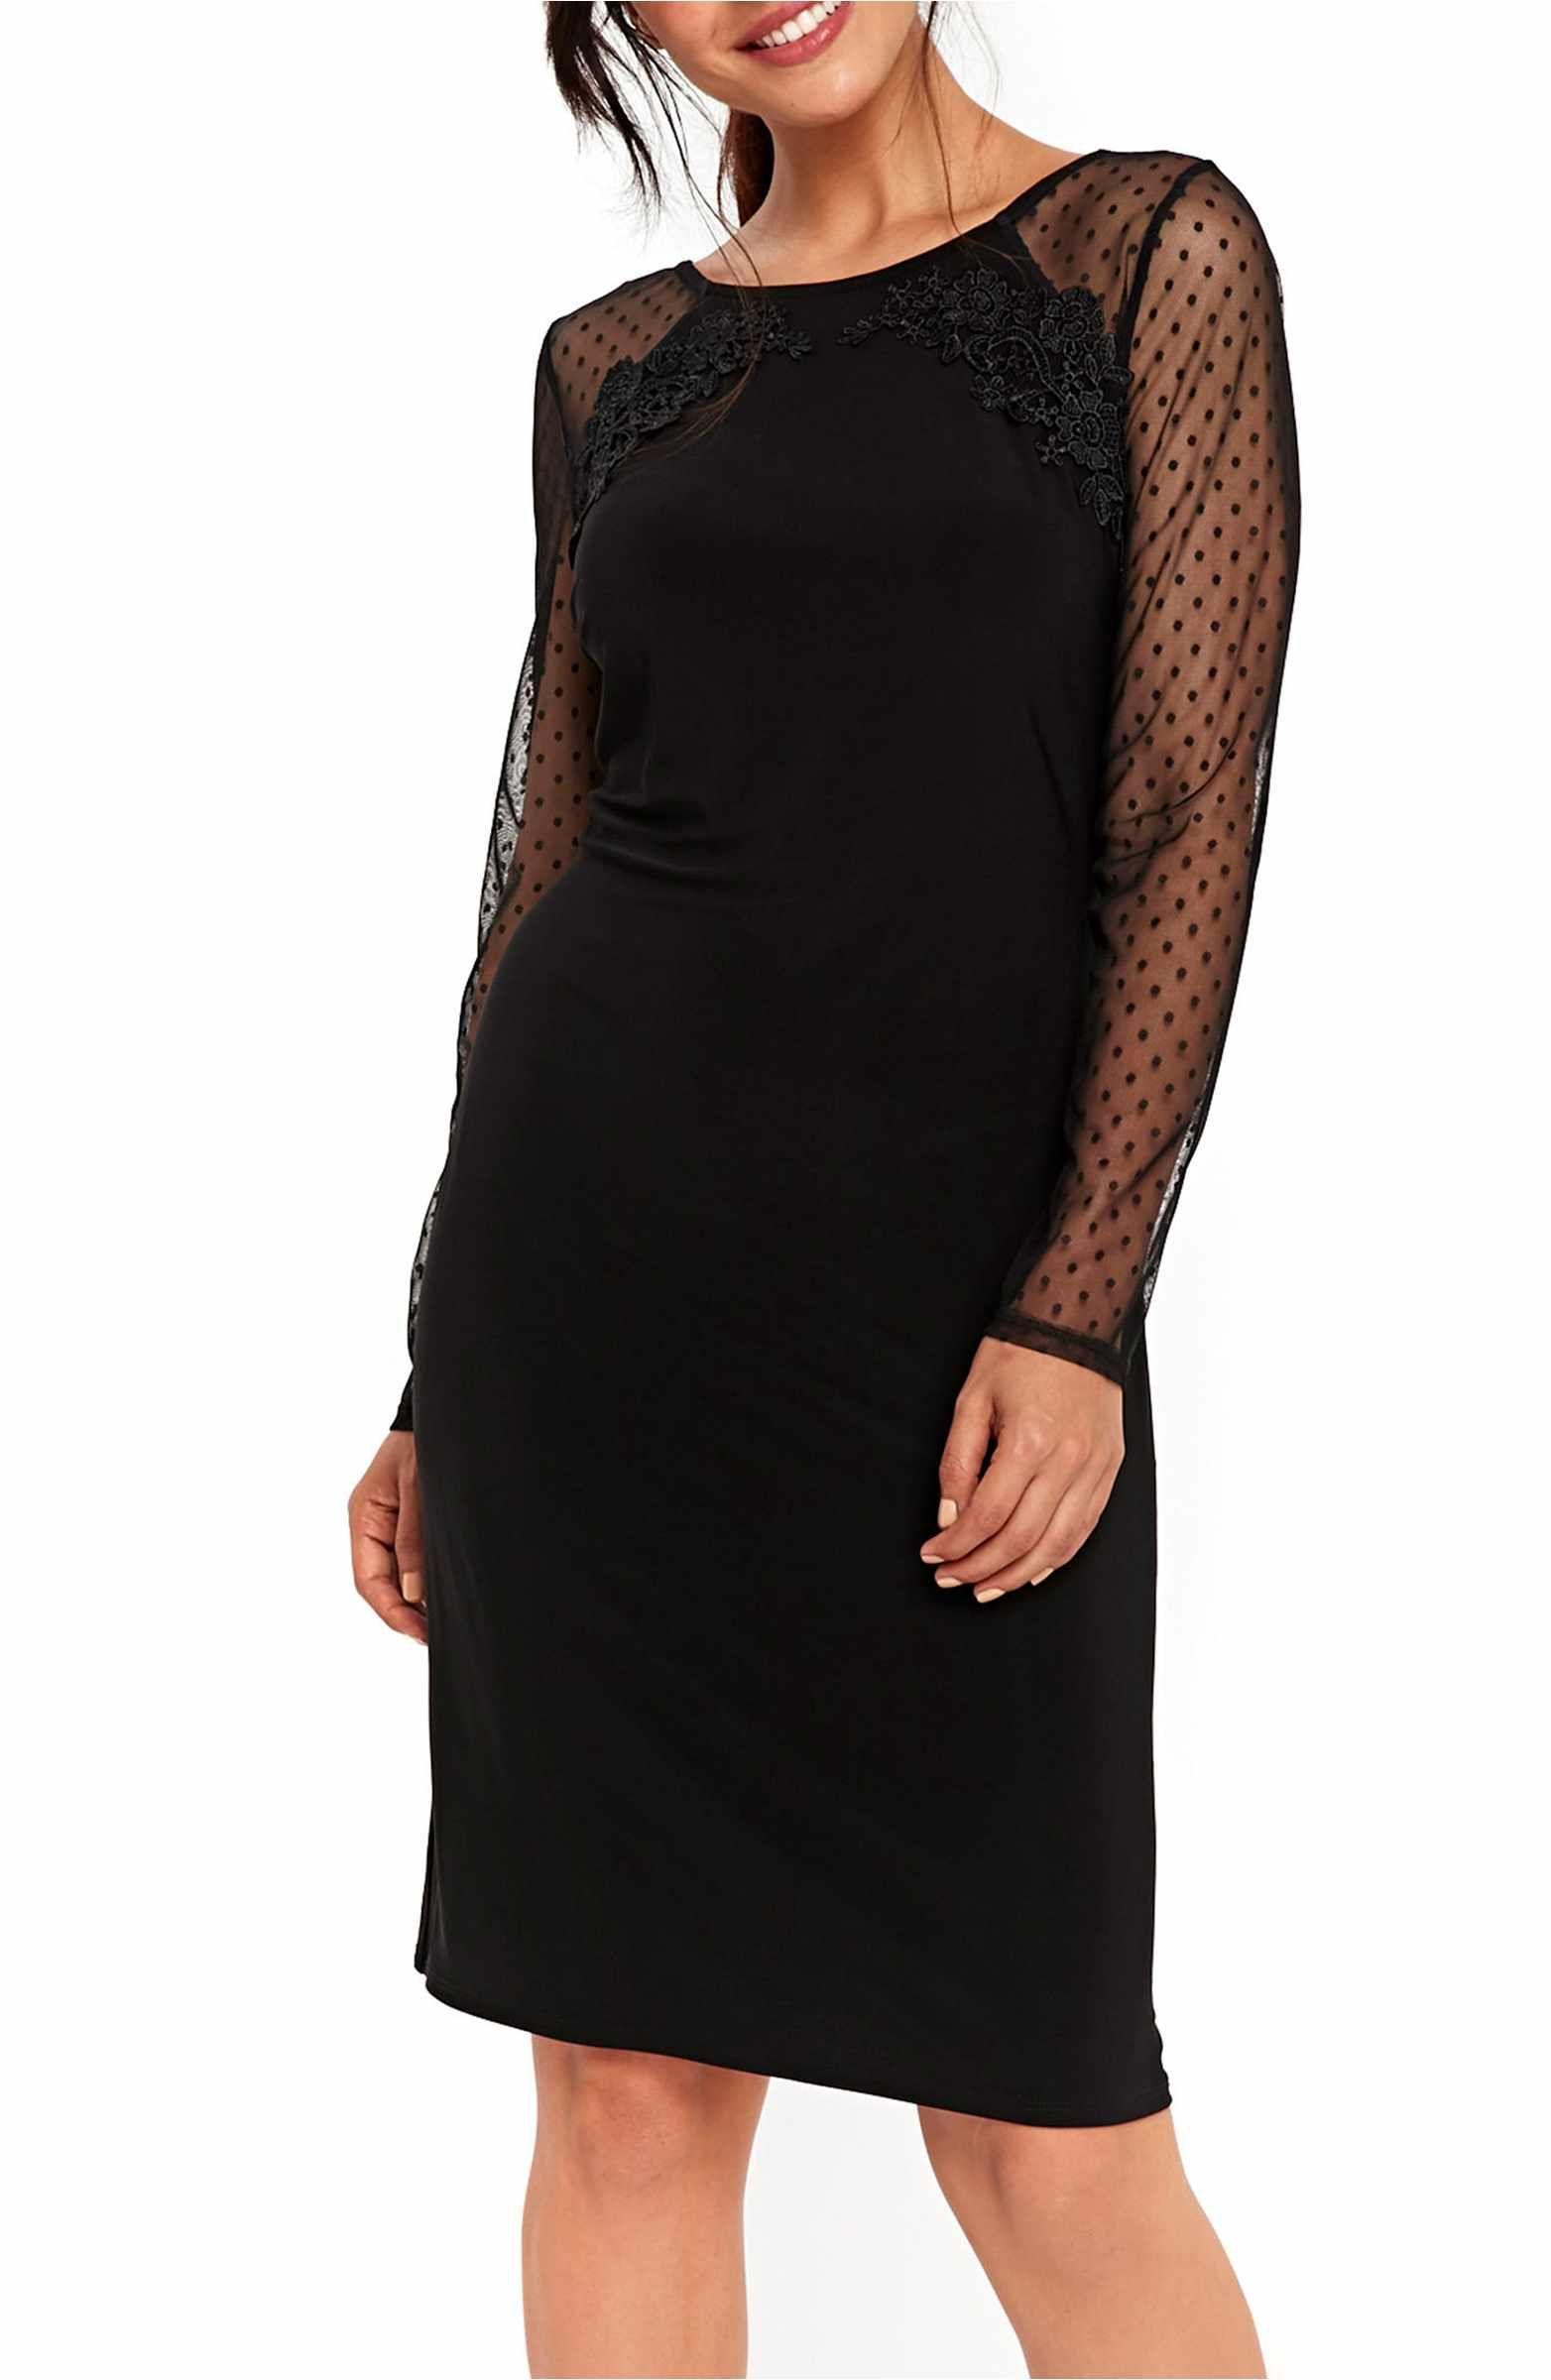 Wallis Dot Mesh Sleeve Sheath Dress Black Party Dresses Mesh Sleeved Dress Mesh Sleeves